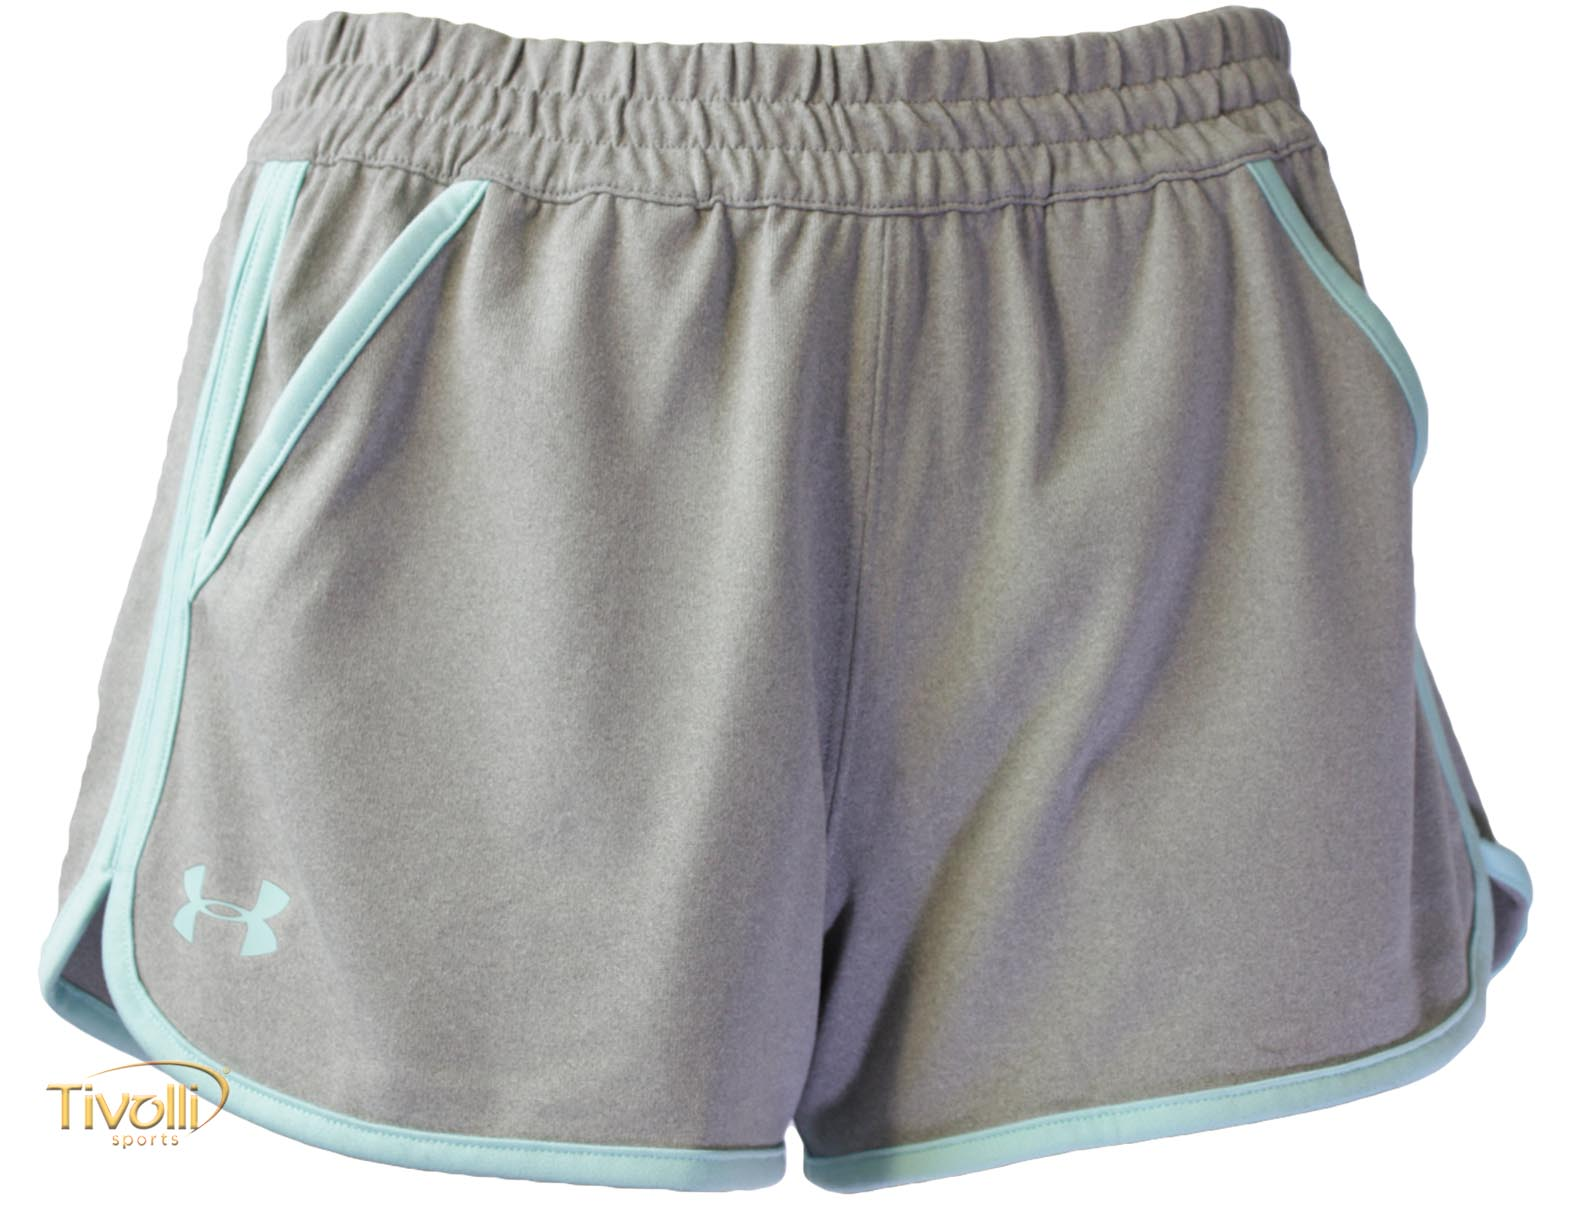 d86ec0afe6 Shorts Feminino Under Armour UA Tech